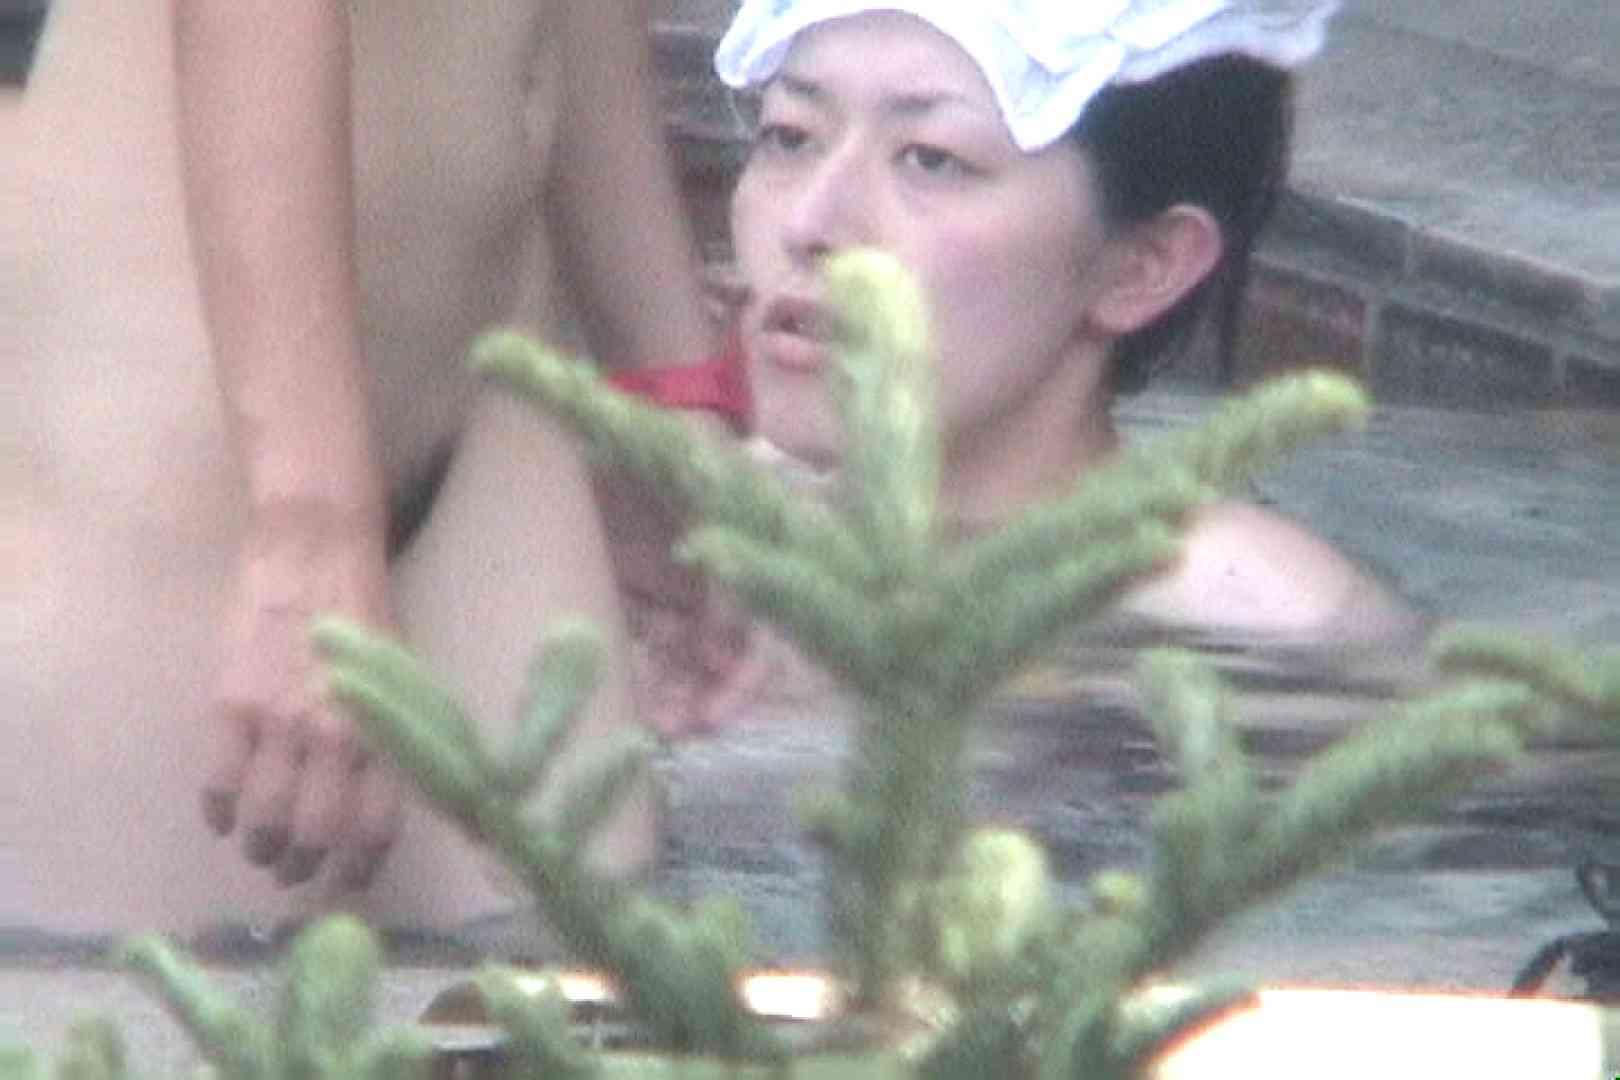 Aquaな露天風呂Vol.80【VIP限定】 盗撮大放出 濡れ場動画紹介 73連発 18